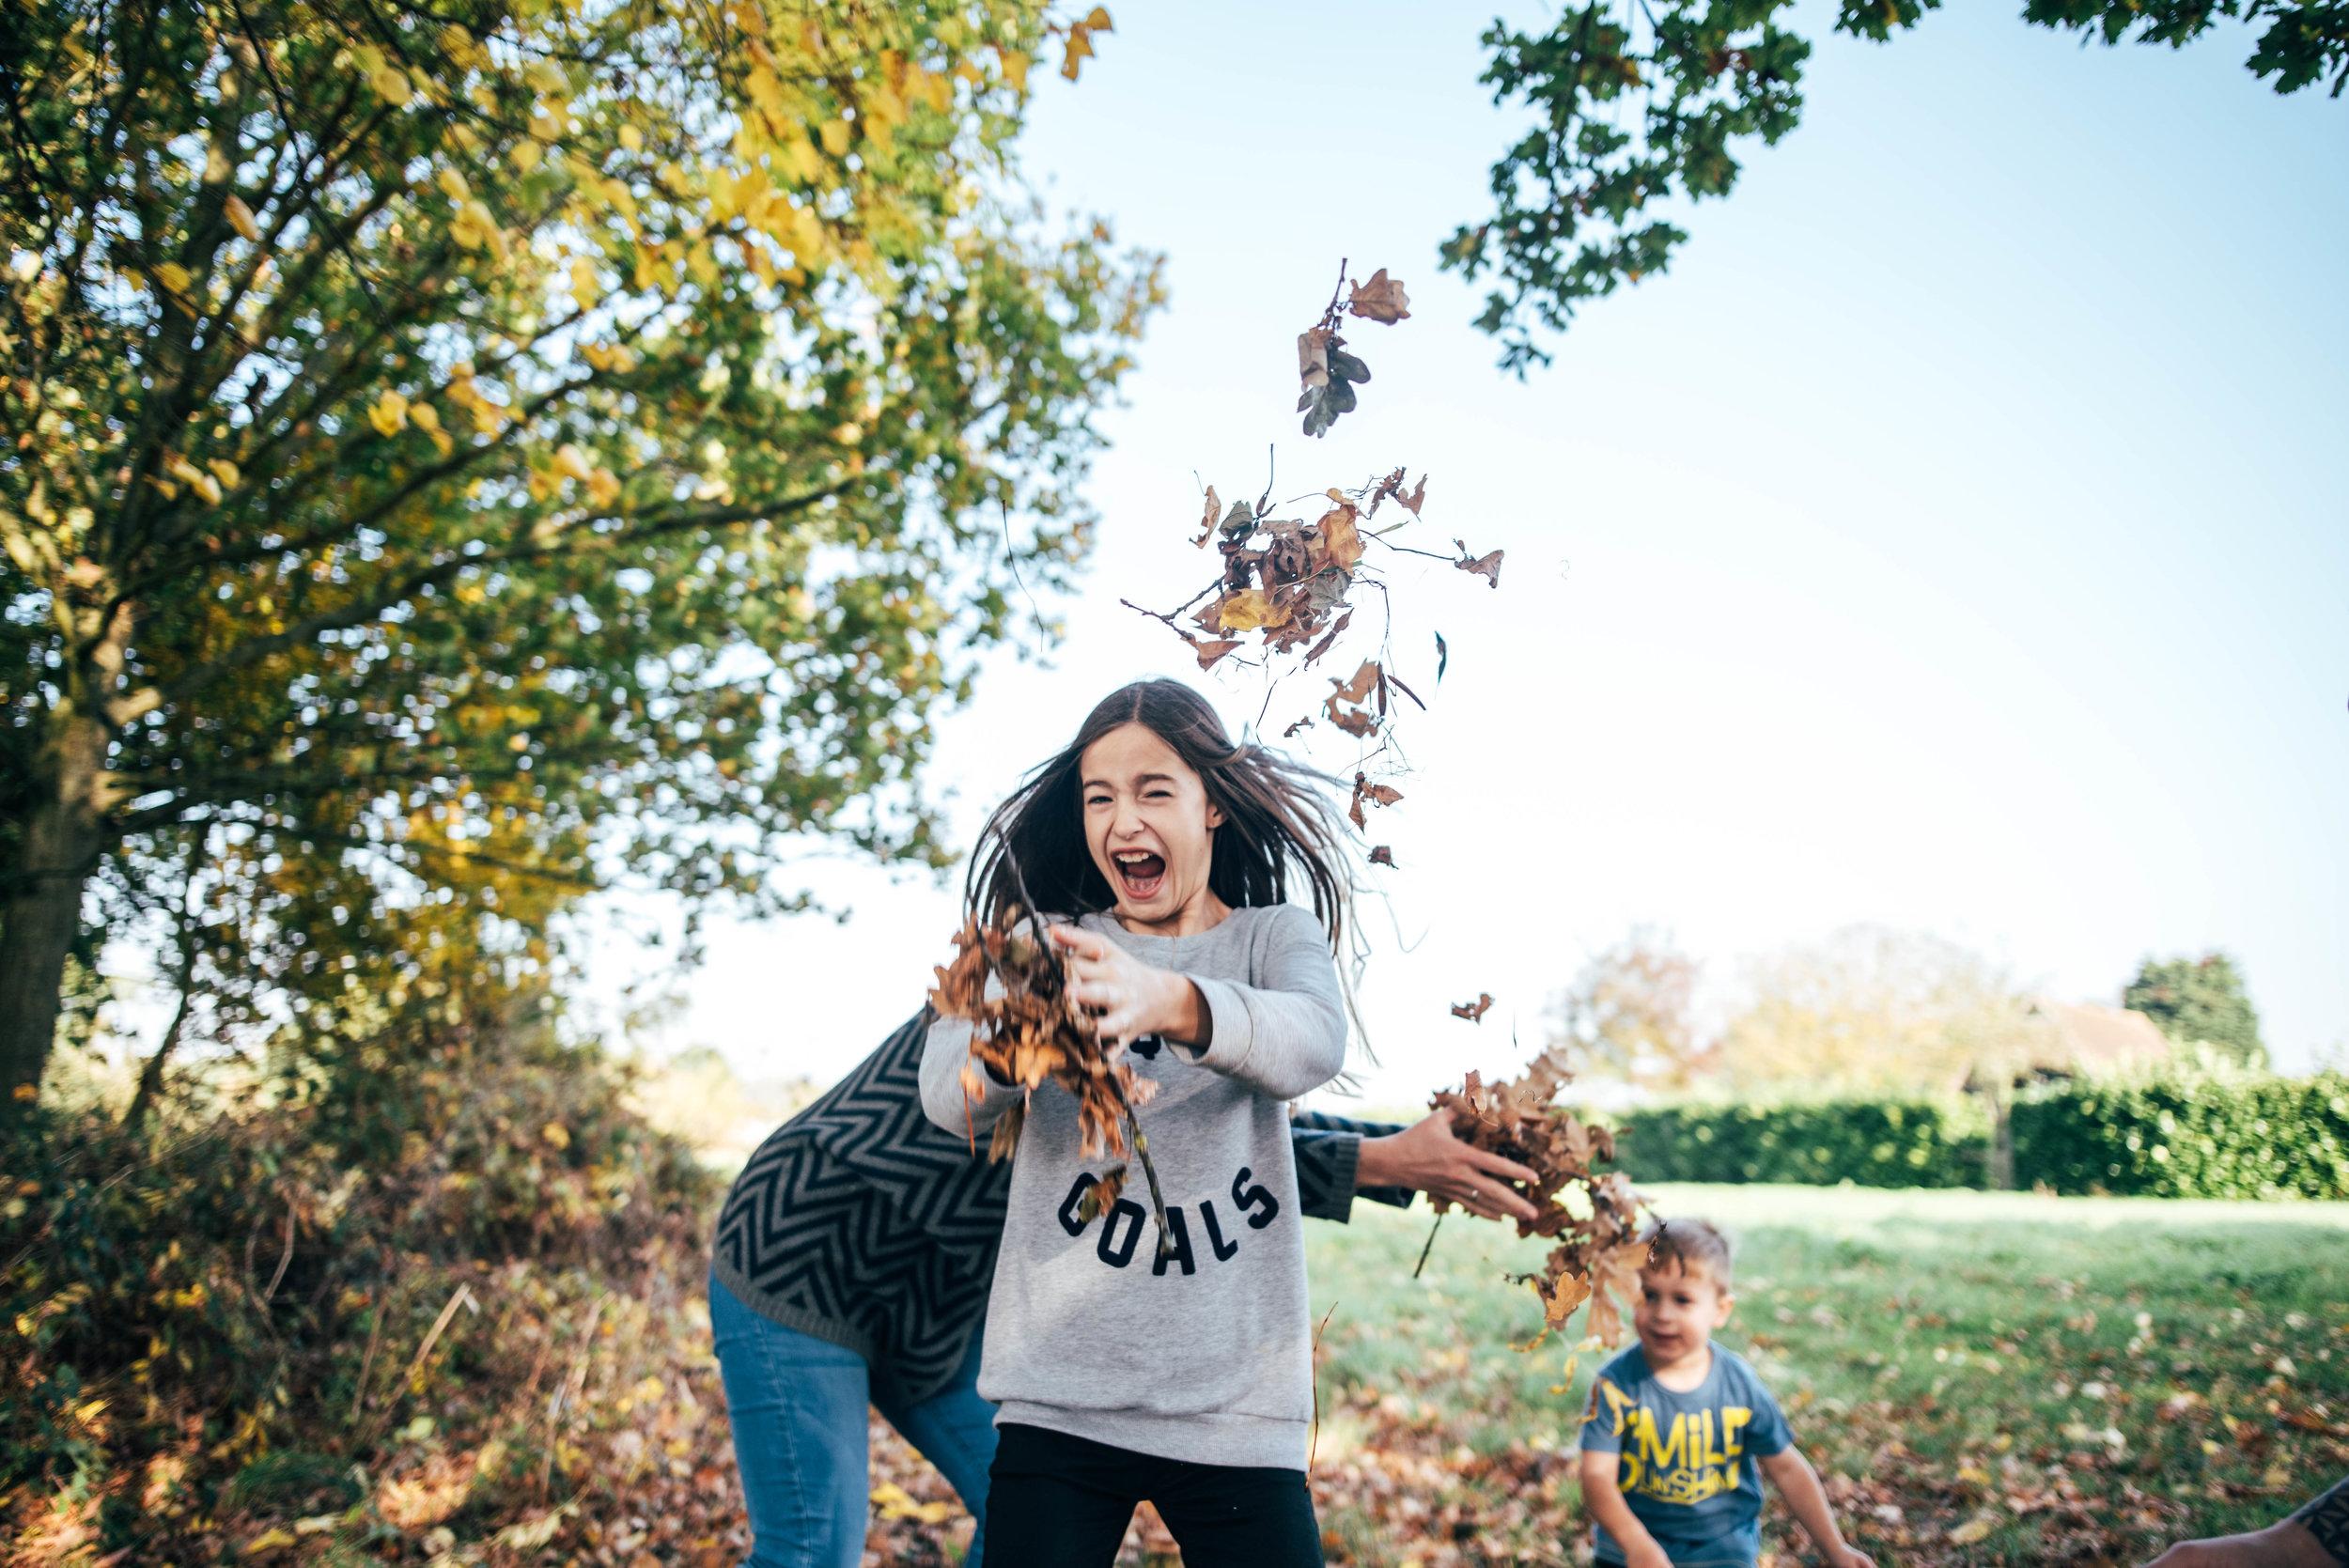 Tween girl throwing autumn leaves Essex UK Documentary Wedding Photographerw